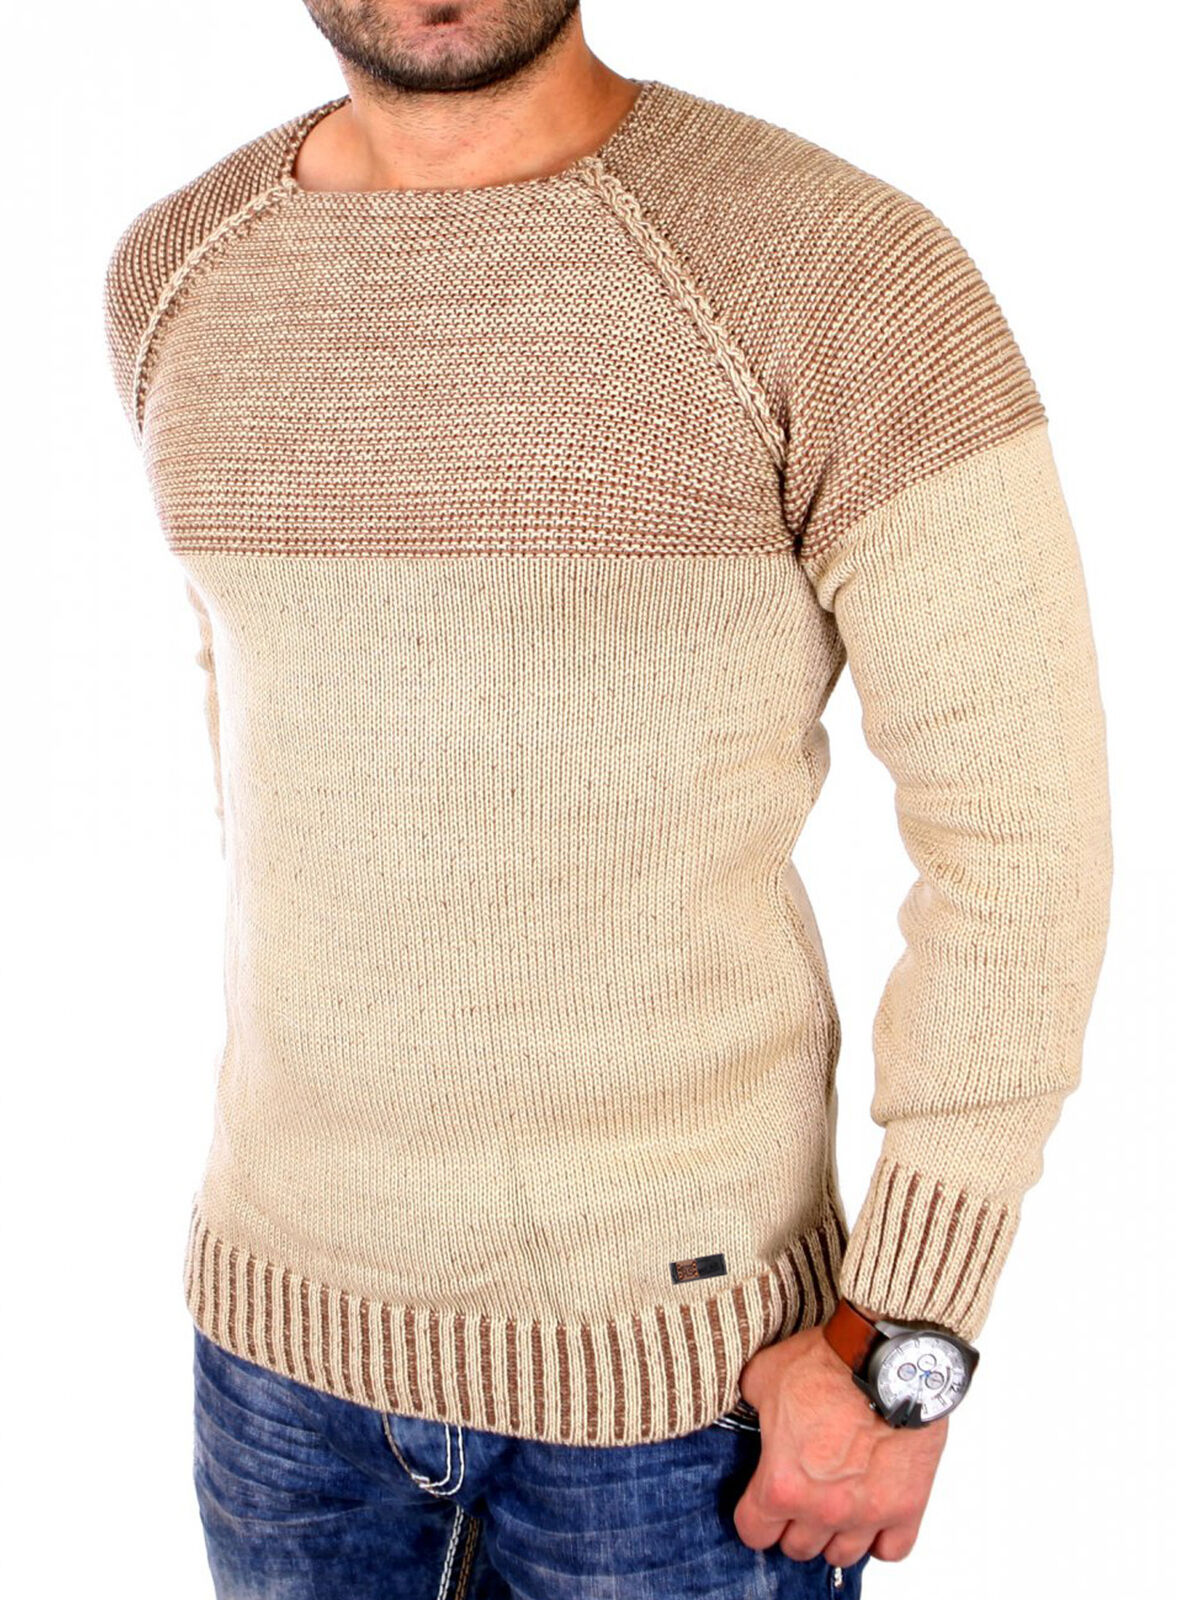 fe92fc89eedb RESLAD STRICKPULLOVER HERREN Pullover Rundhals Grobstrick Pulli Sweatshirt  16081